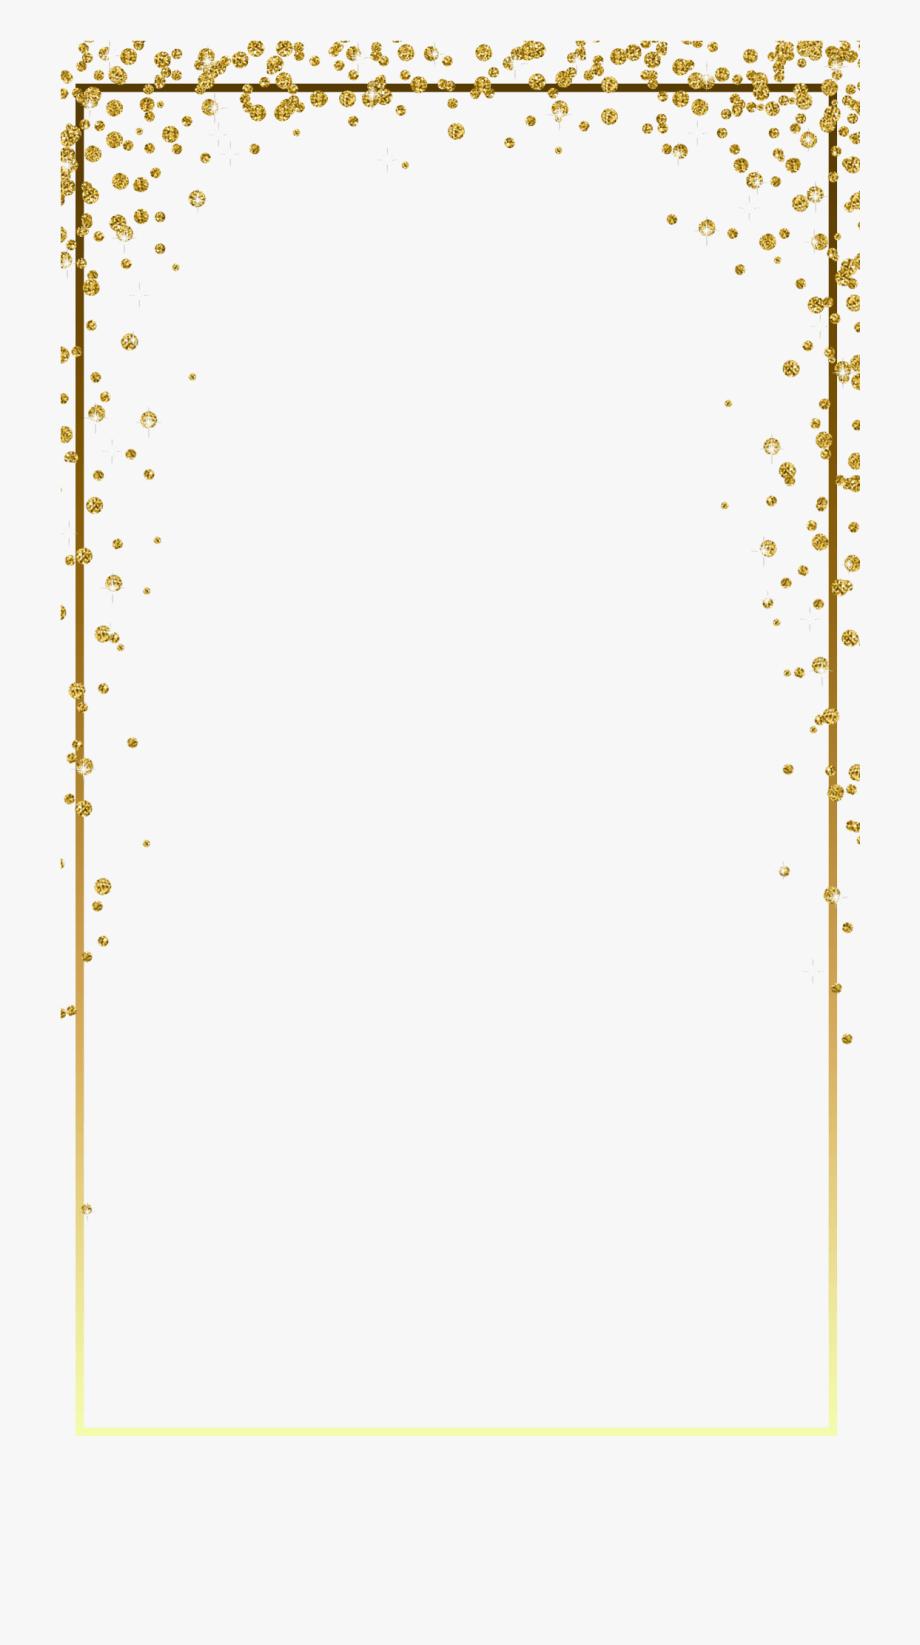 Snapchat border clipart clip art download Gold Glitter Frame Png Image - Snapchat Border Png #479196 ... clip art download